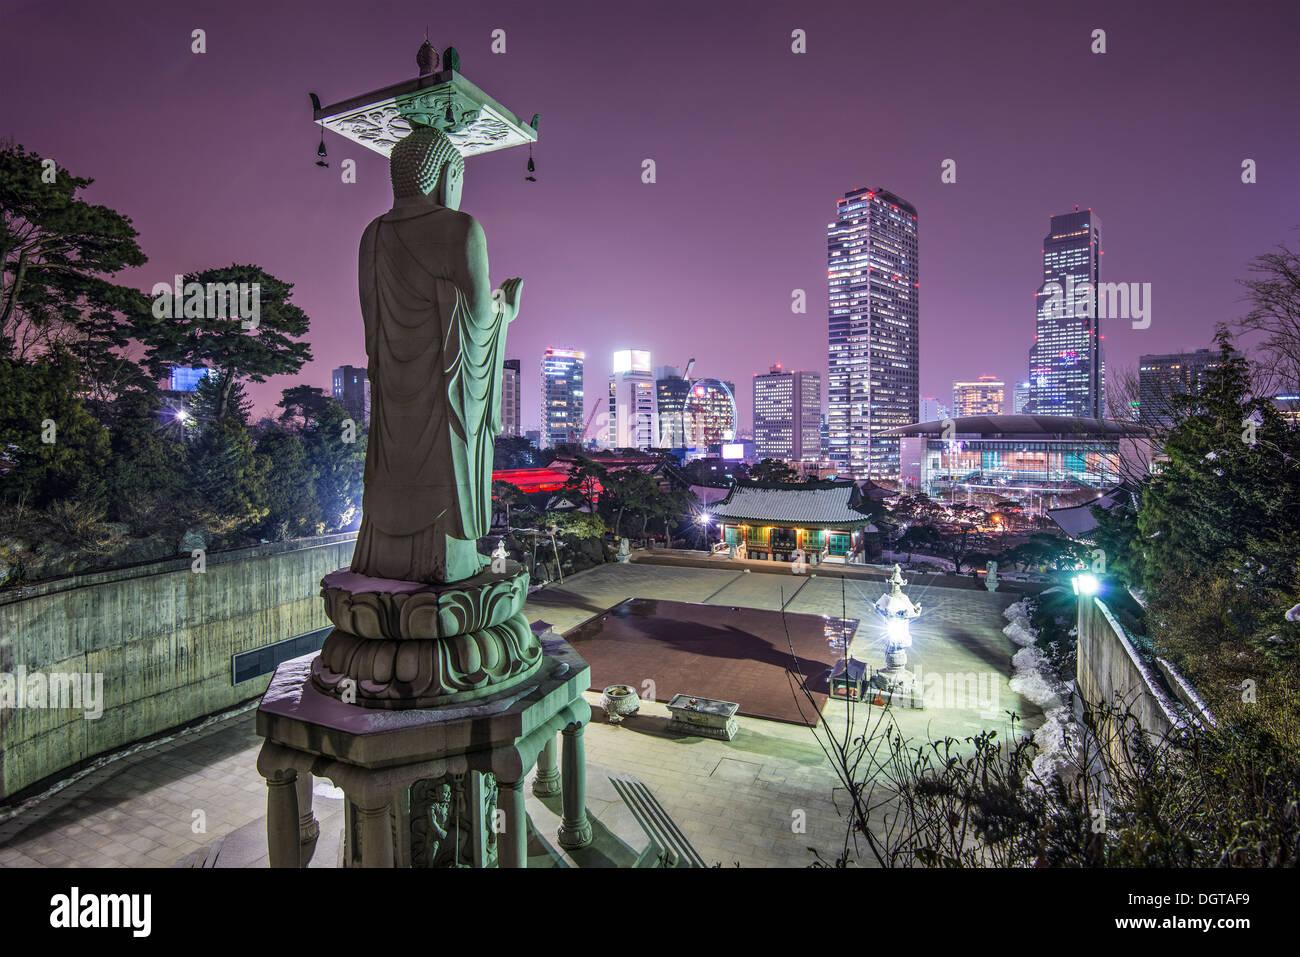 Seoul, South Korea at Bongeunsa Temple. - Stock Image